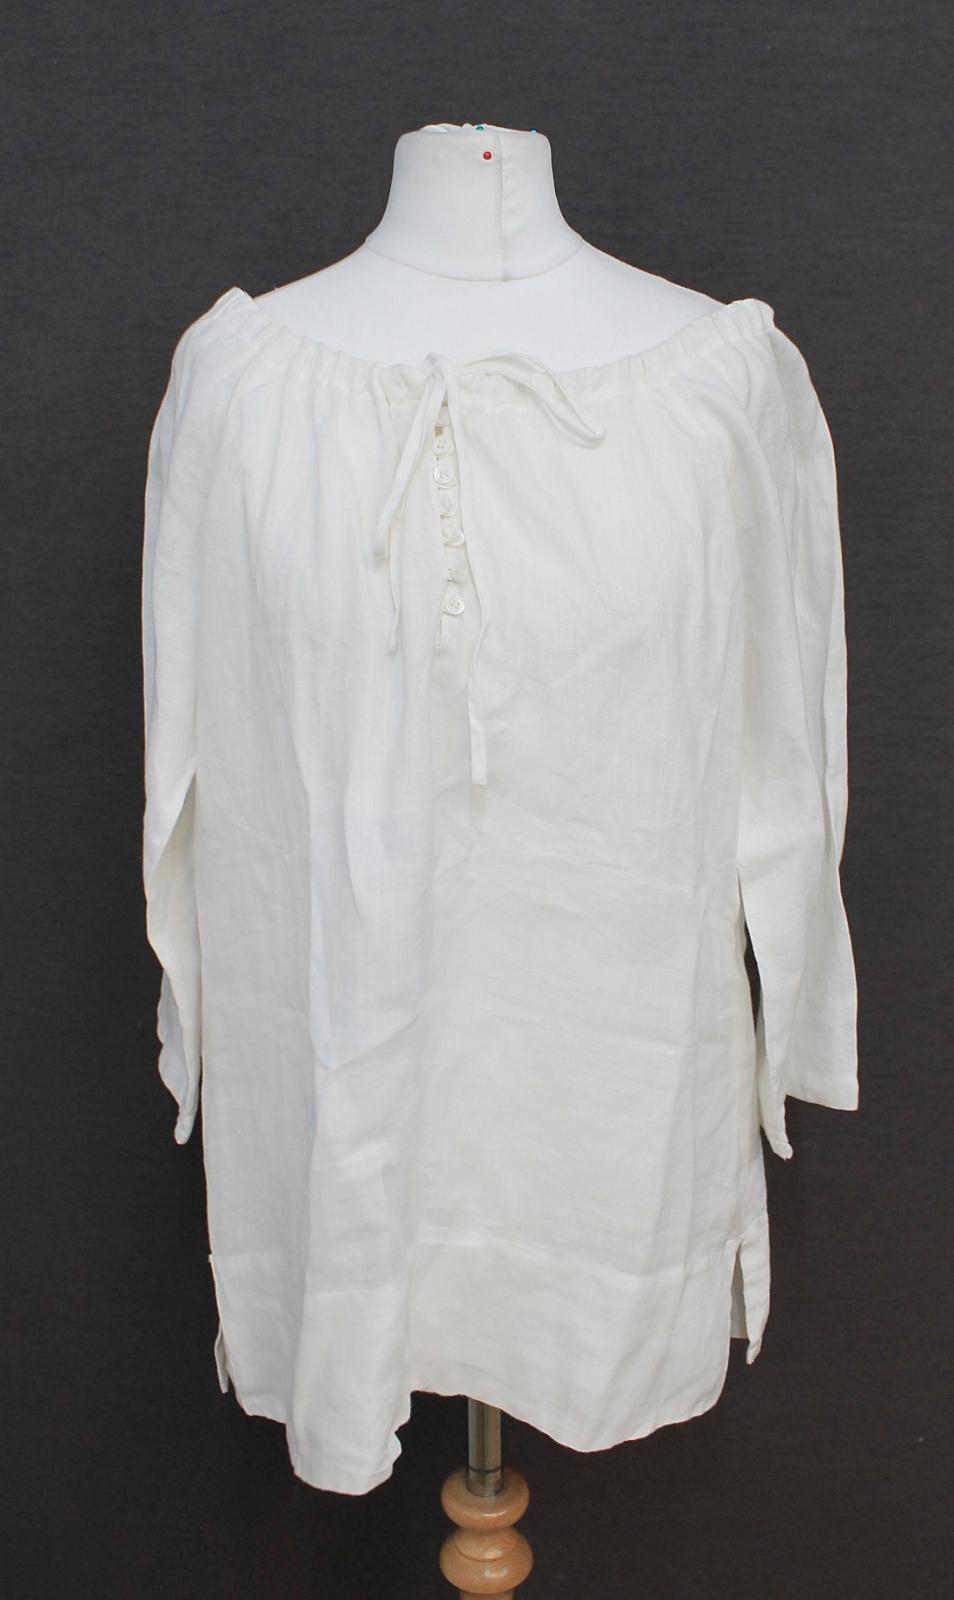 L-K-BENNETT-Ladies-Ivory-Linen-Long-Sleeved-Boat-Neck-Blouse-Size-Approx-M